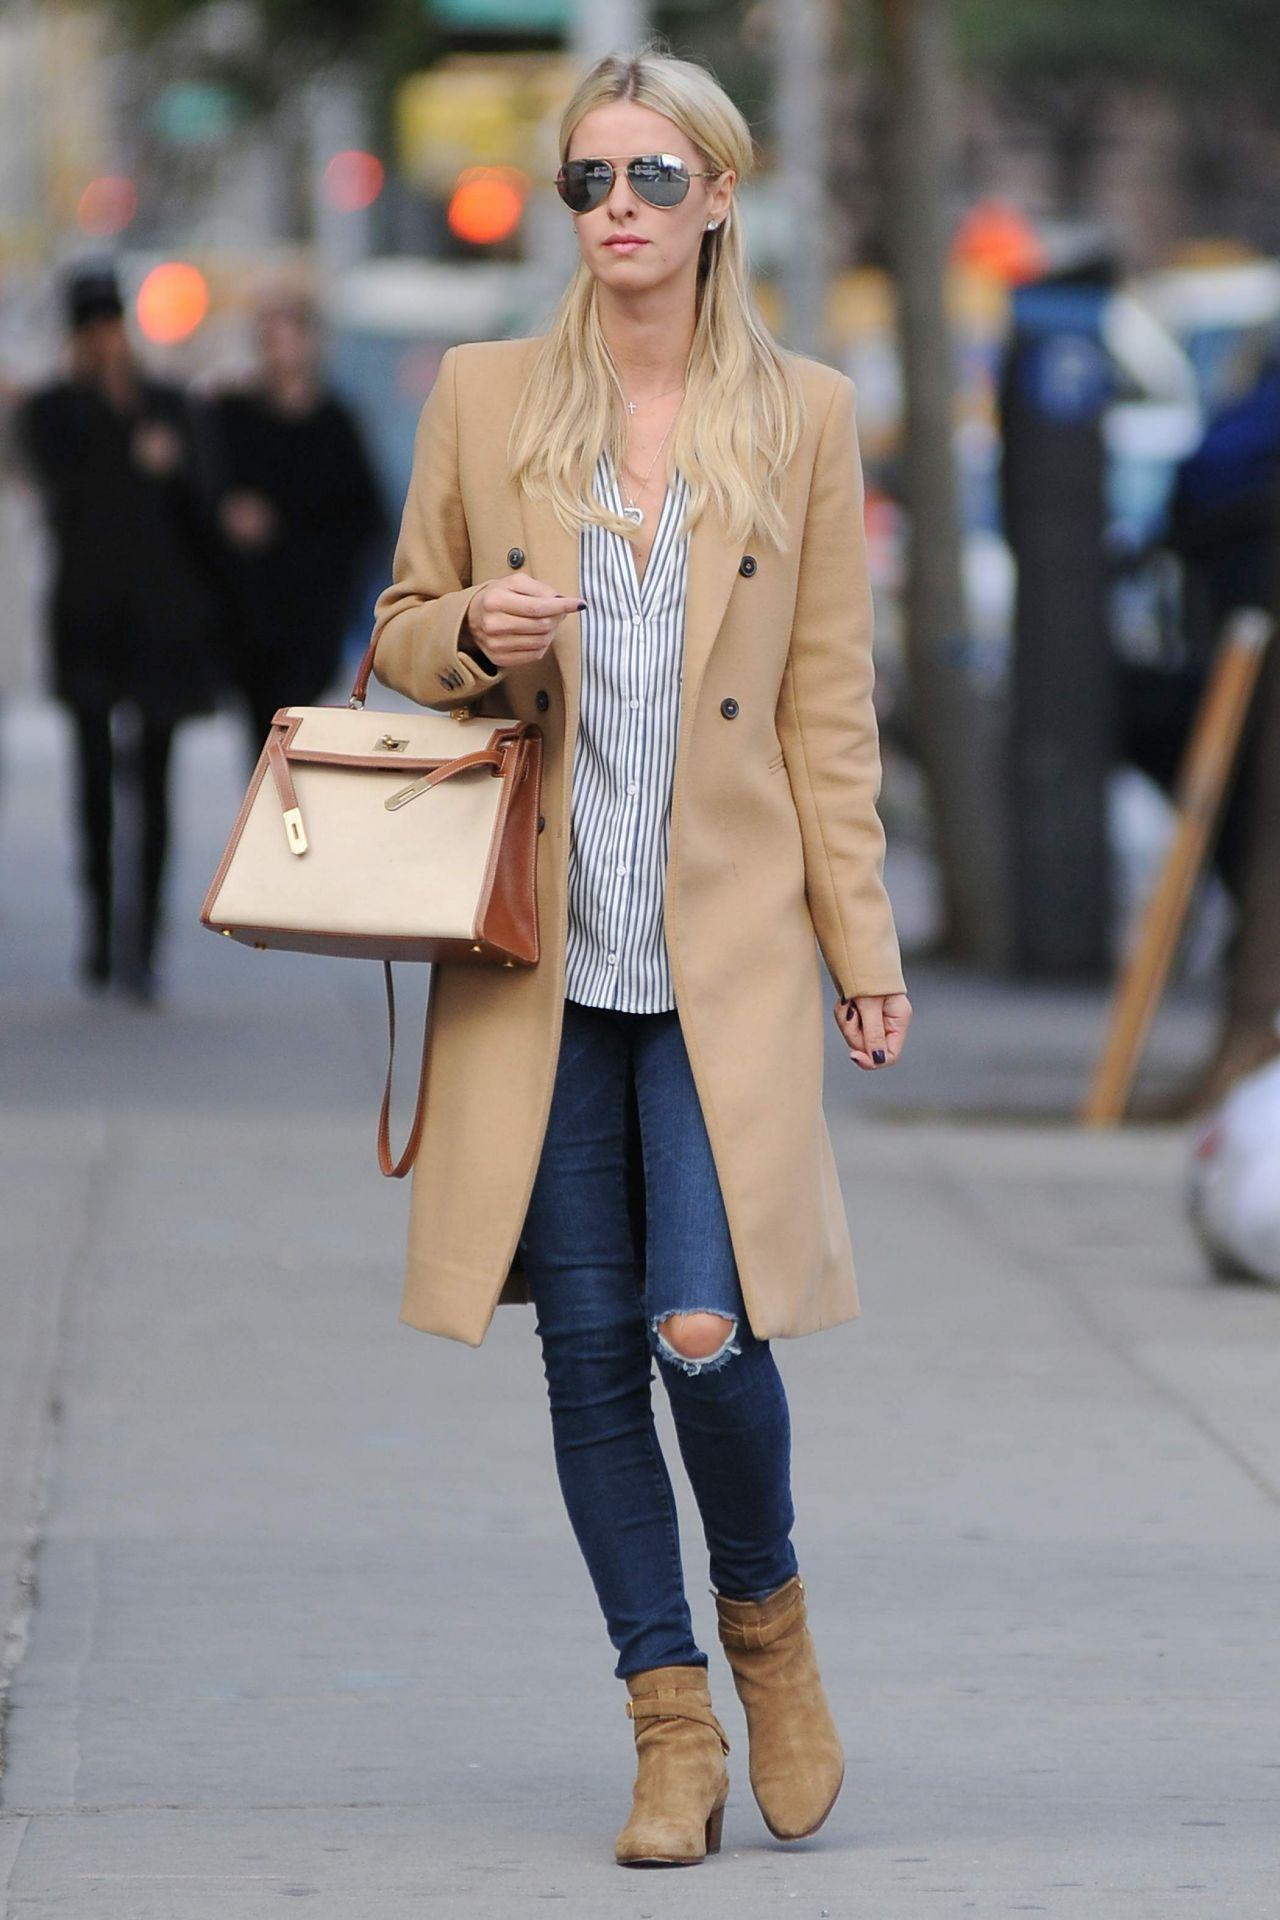 Nicky Hilton Rothschild Street Style New York City October 2015